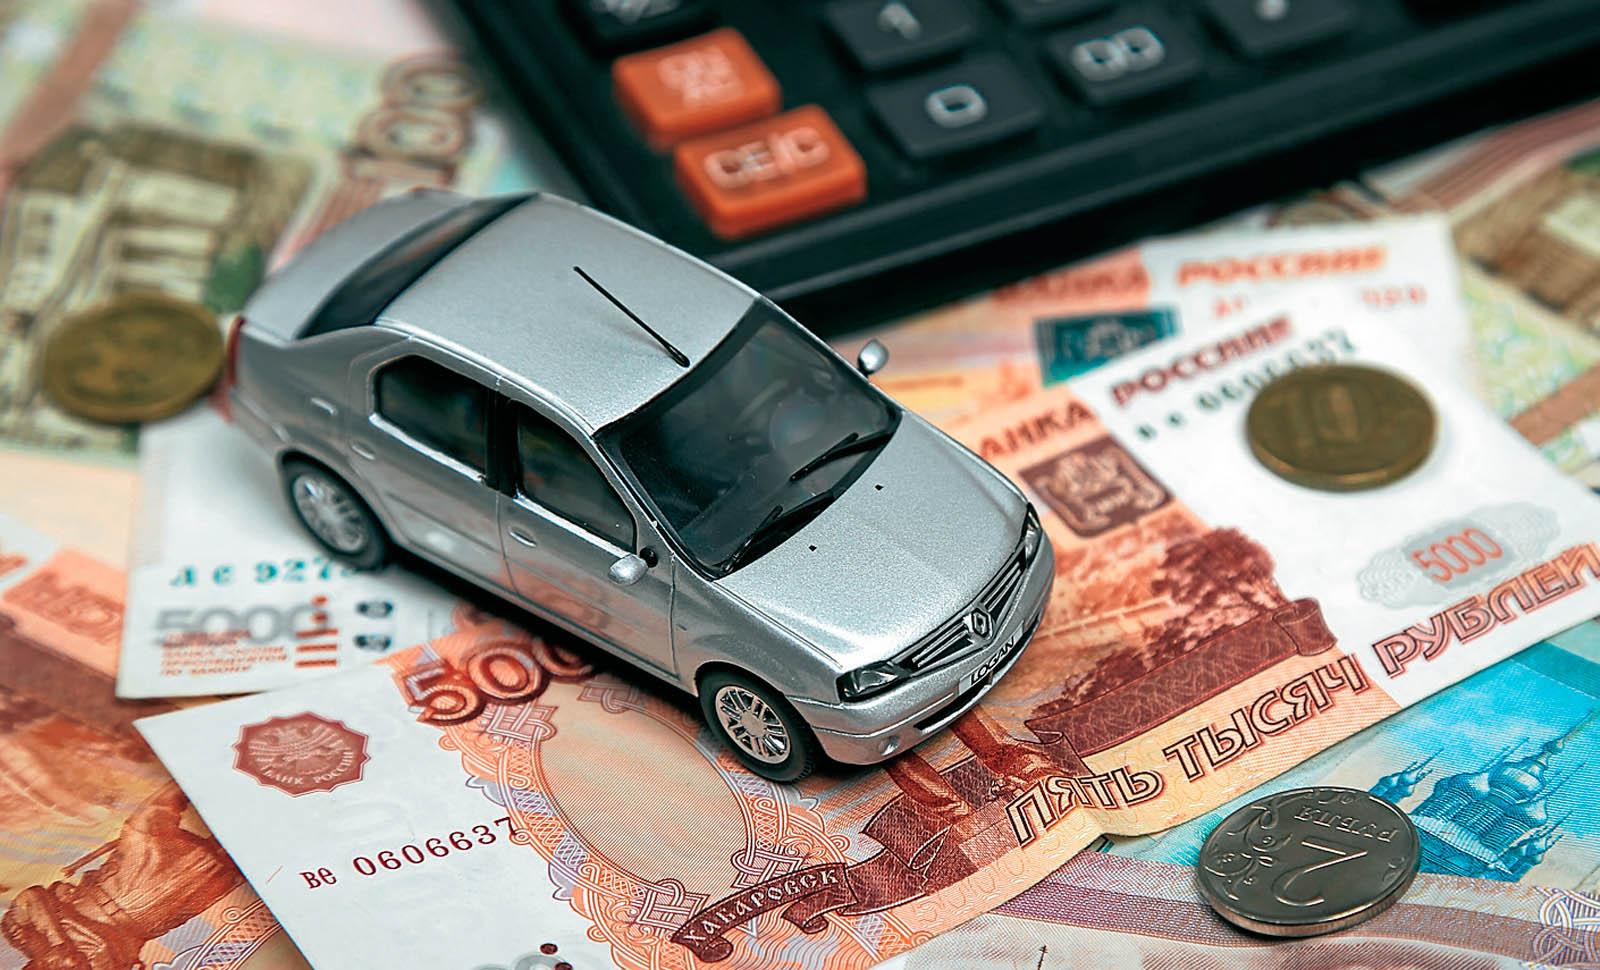 Nissan Almera, 2018, бензин механика, купить в Беларуси - цена 22 400